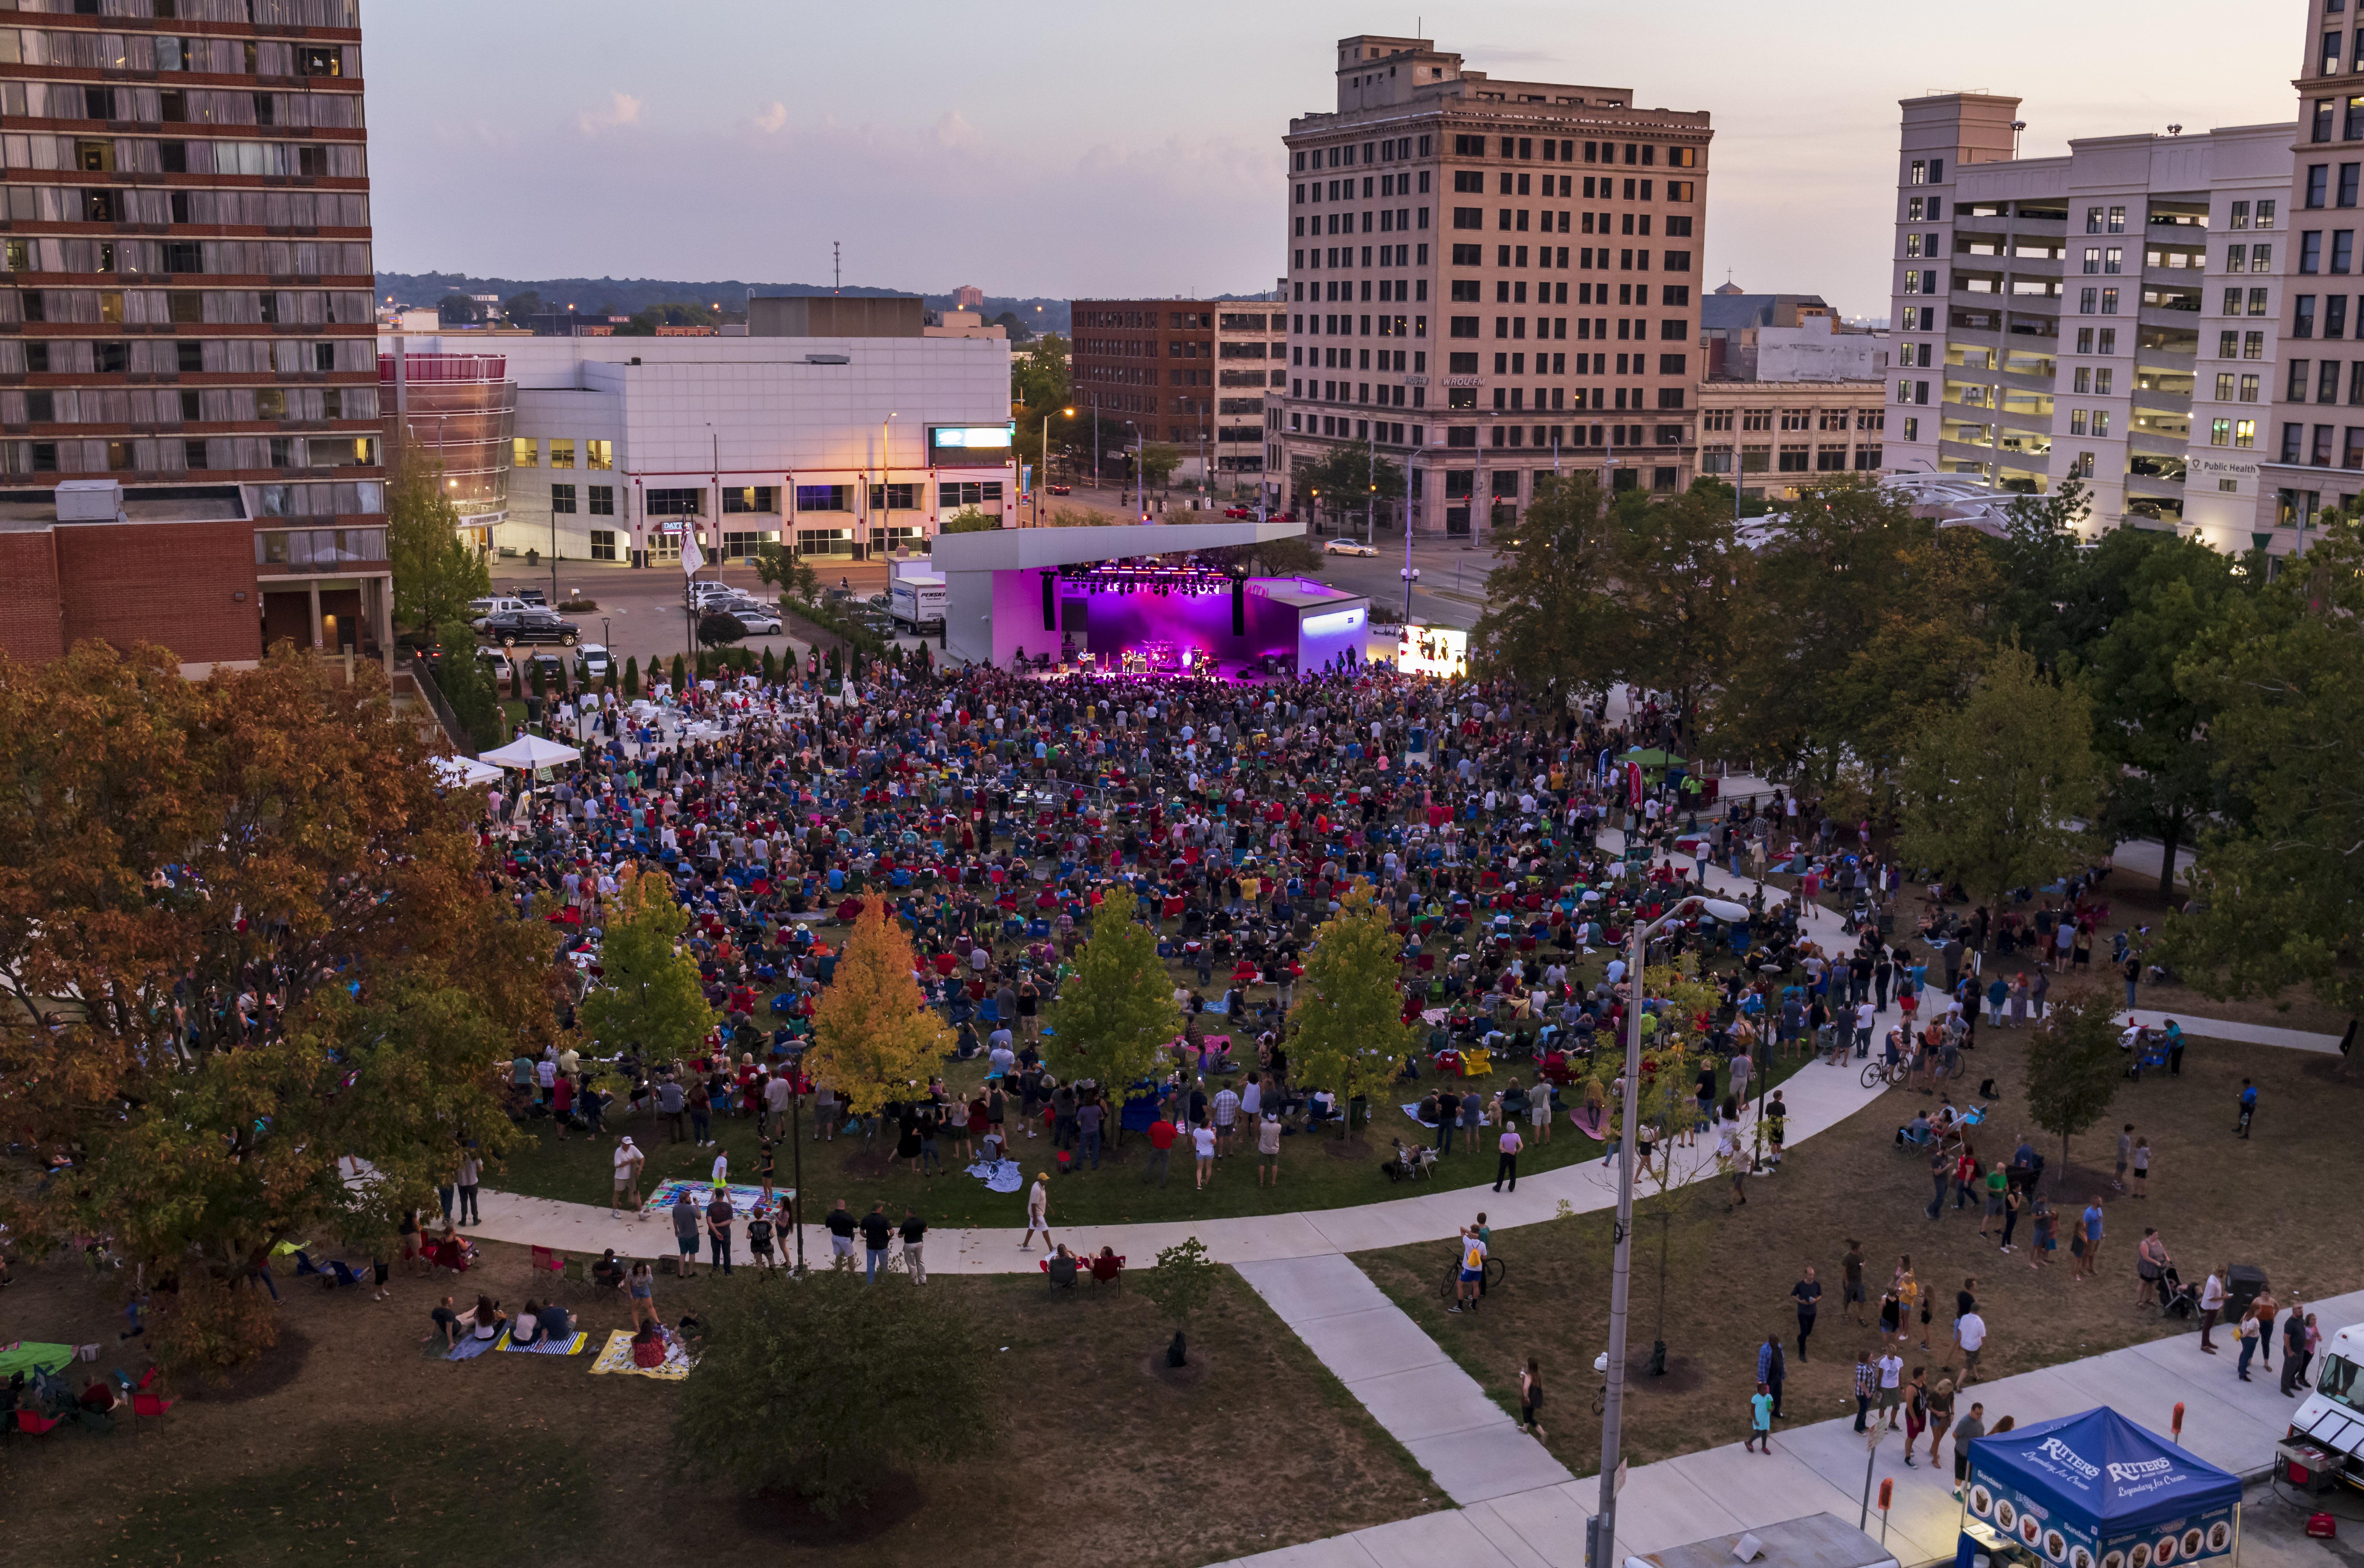 A concert at Levitt Pavilion Dayton in Dave Hall Plaza